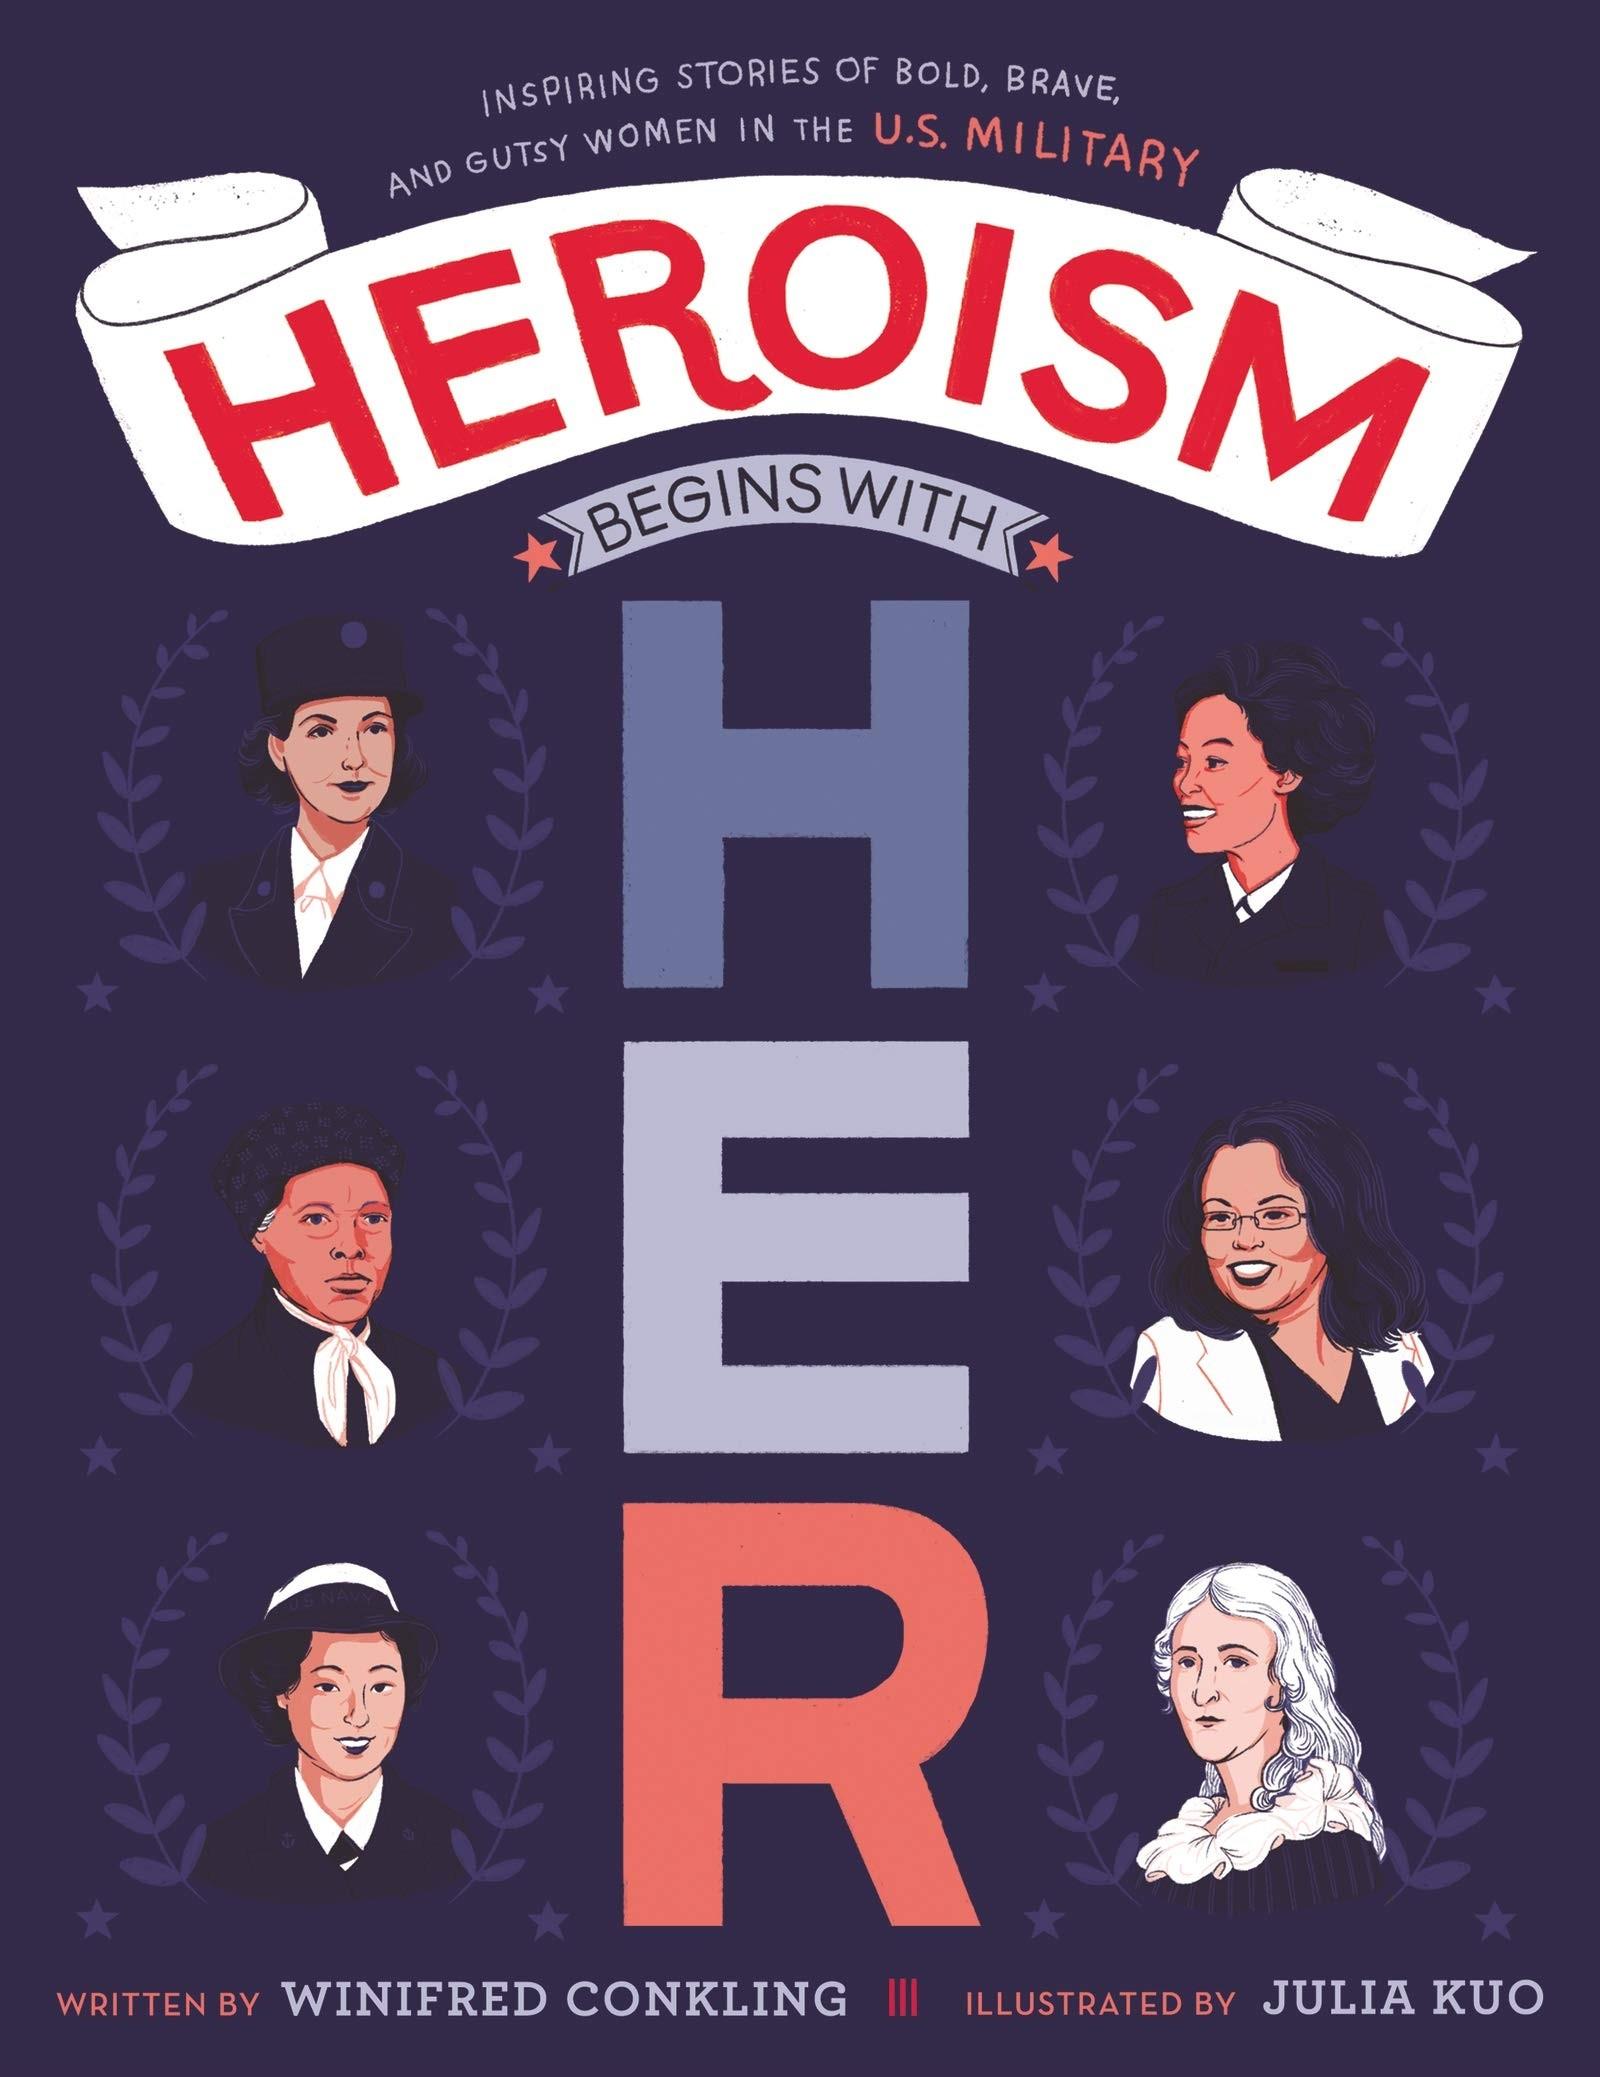 Women/'s History Month STEM Inspiring Innovation Through Imagination DOD Poster